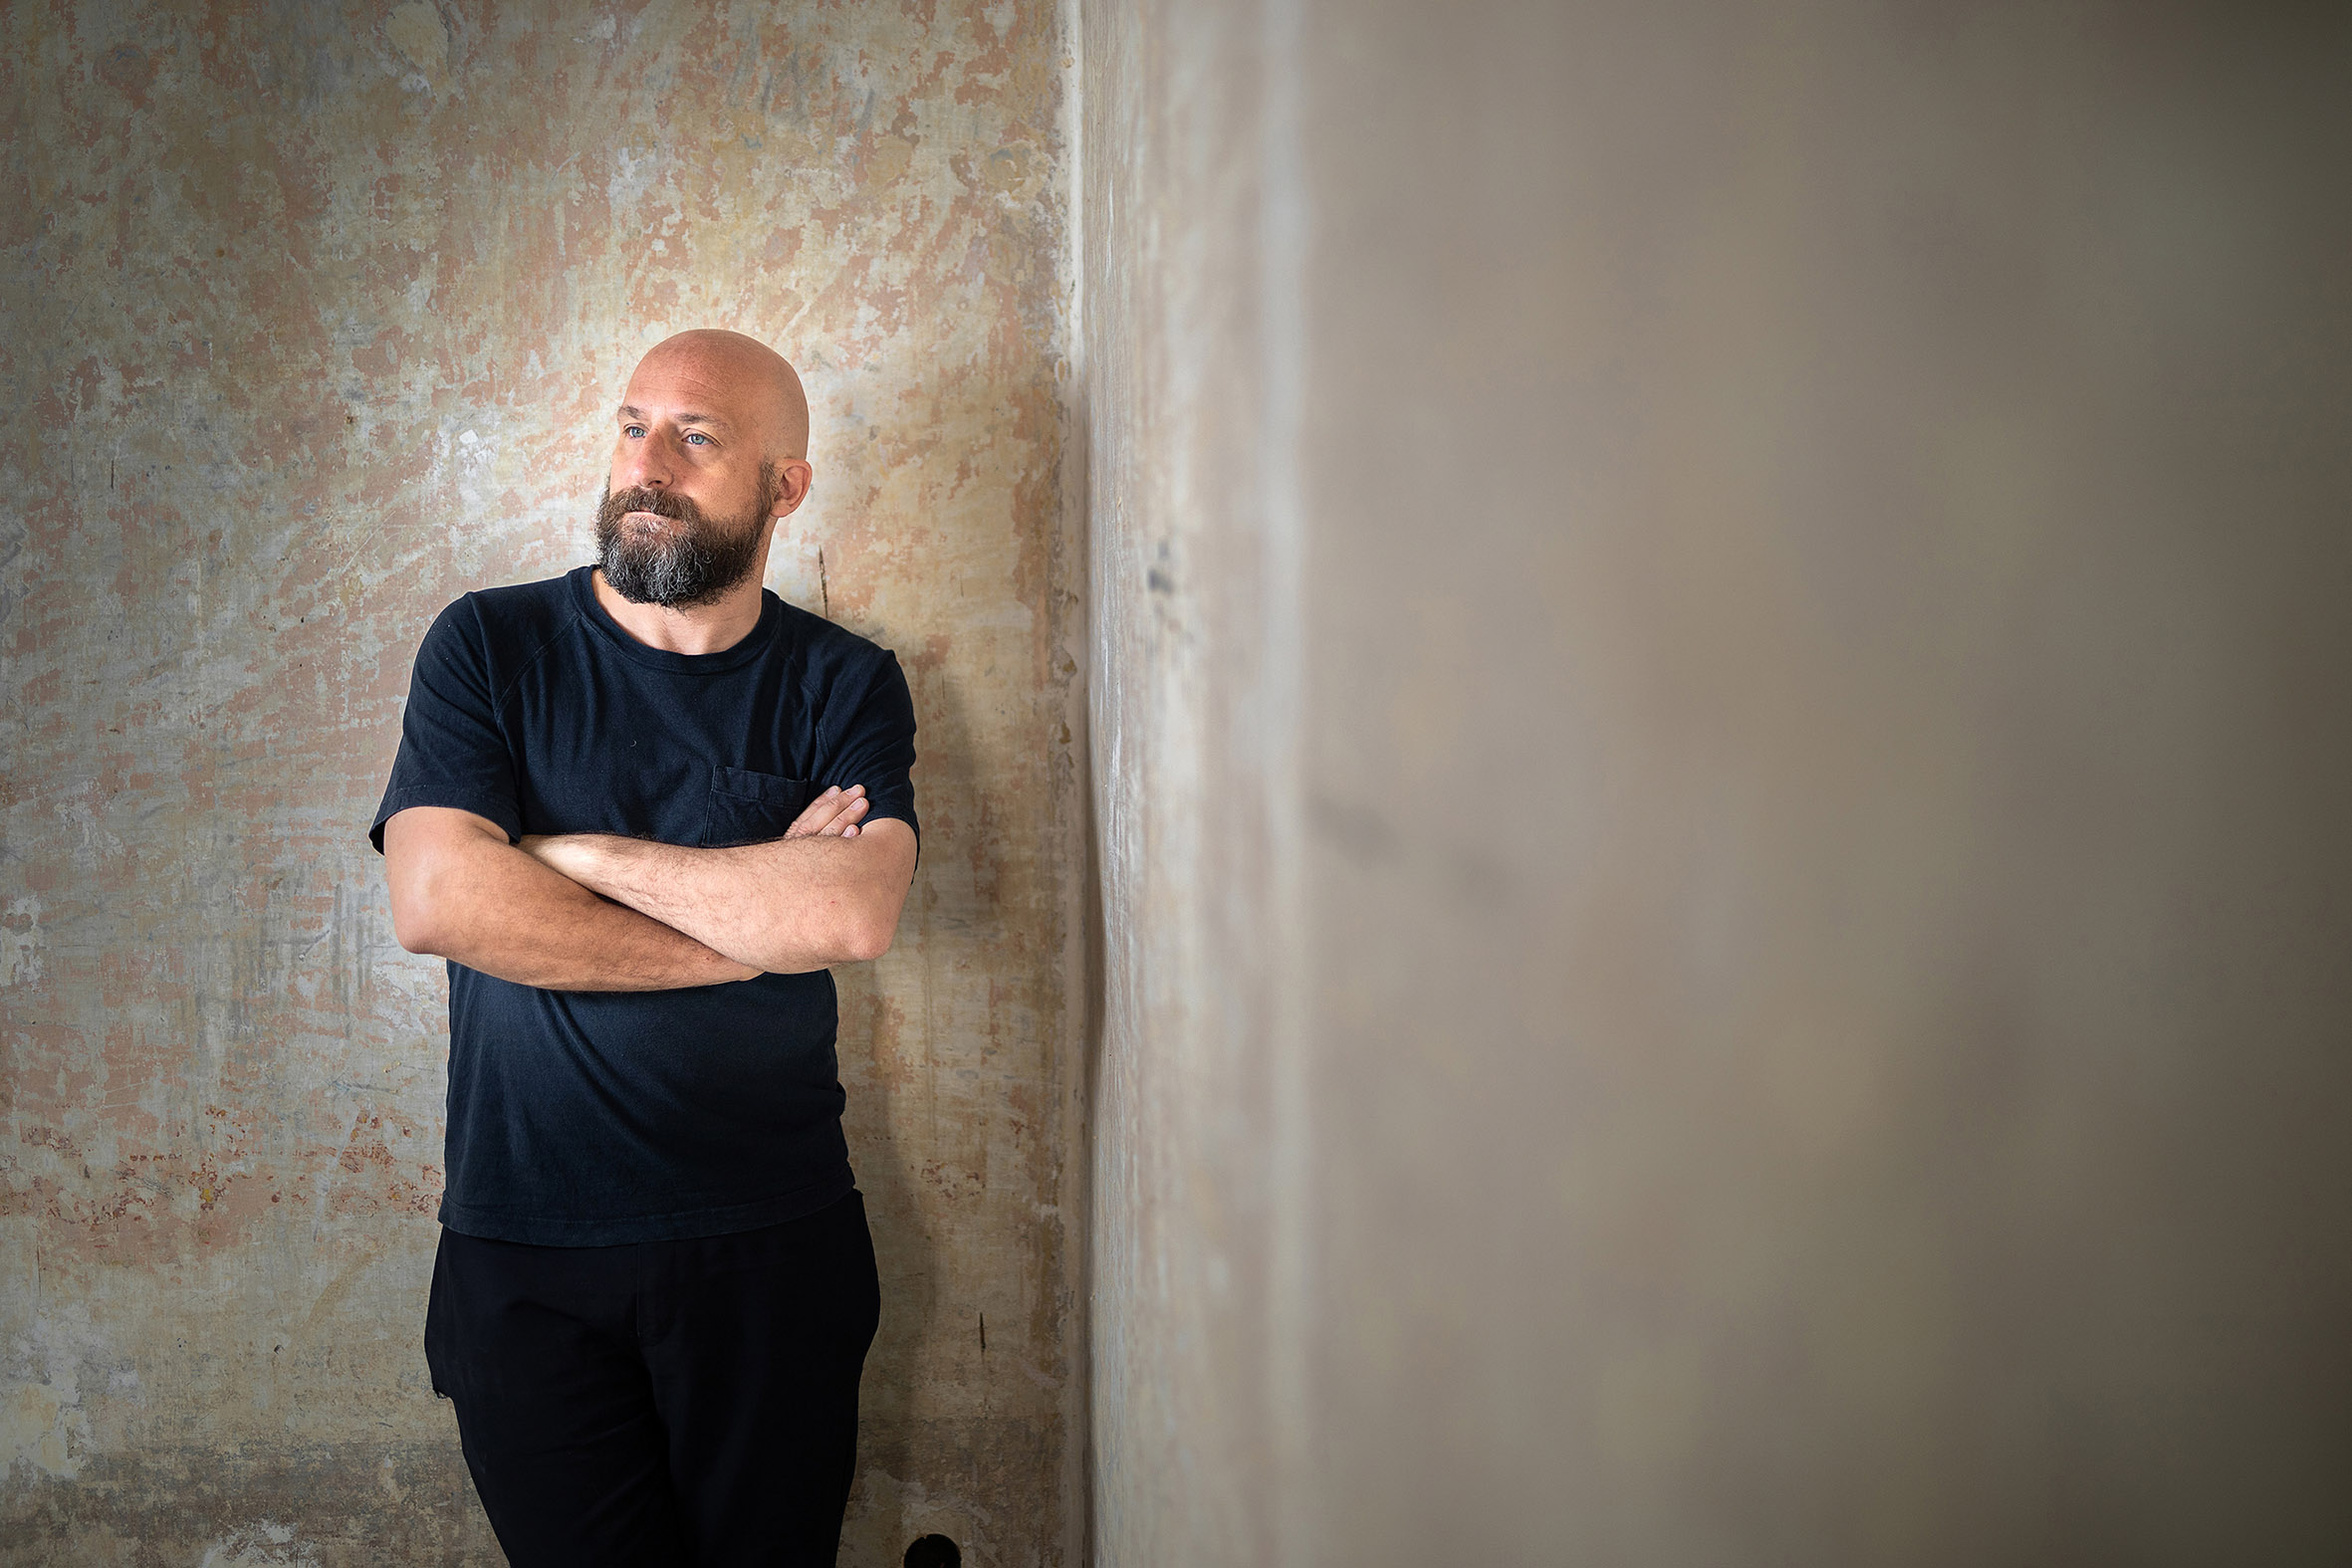 Luca De Felice e Simposio Design Creatori di storie